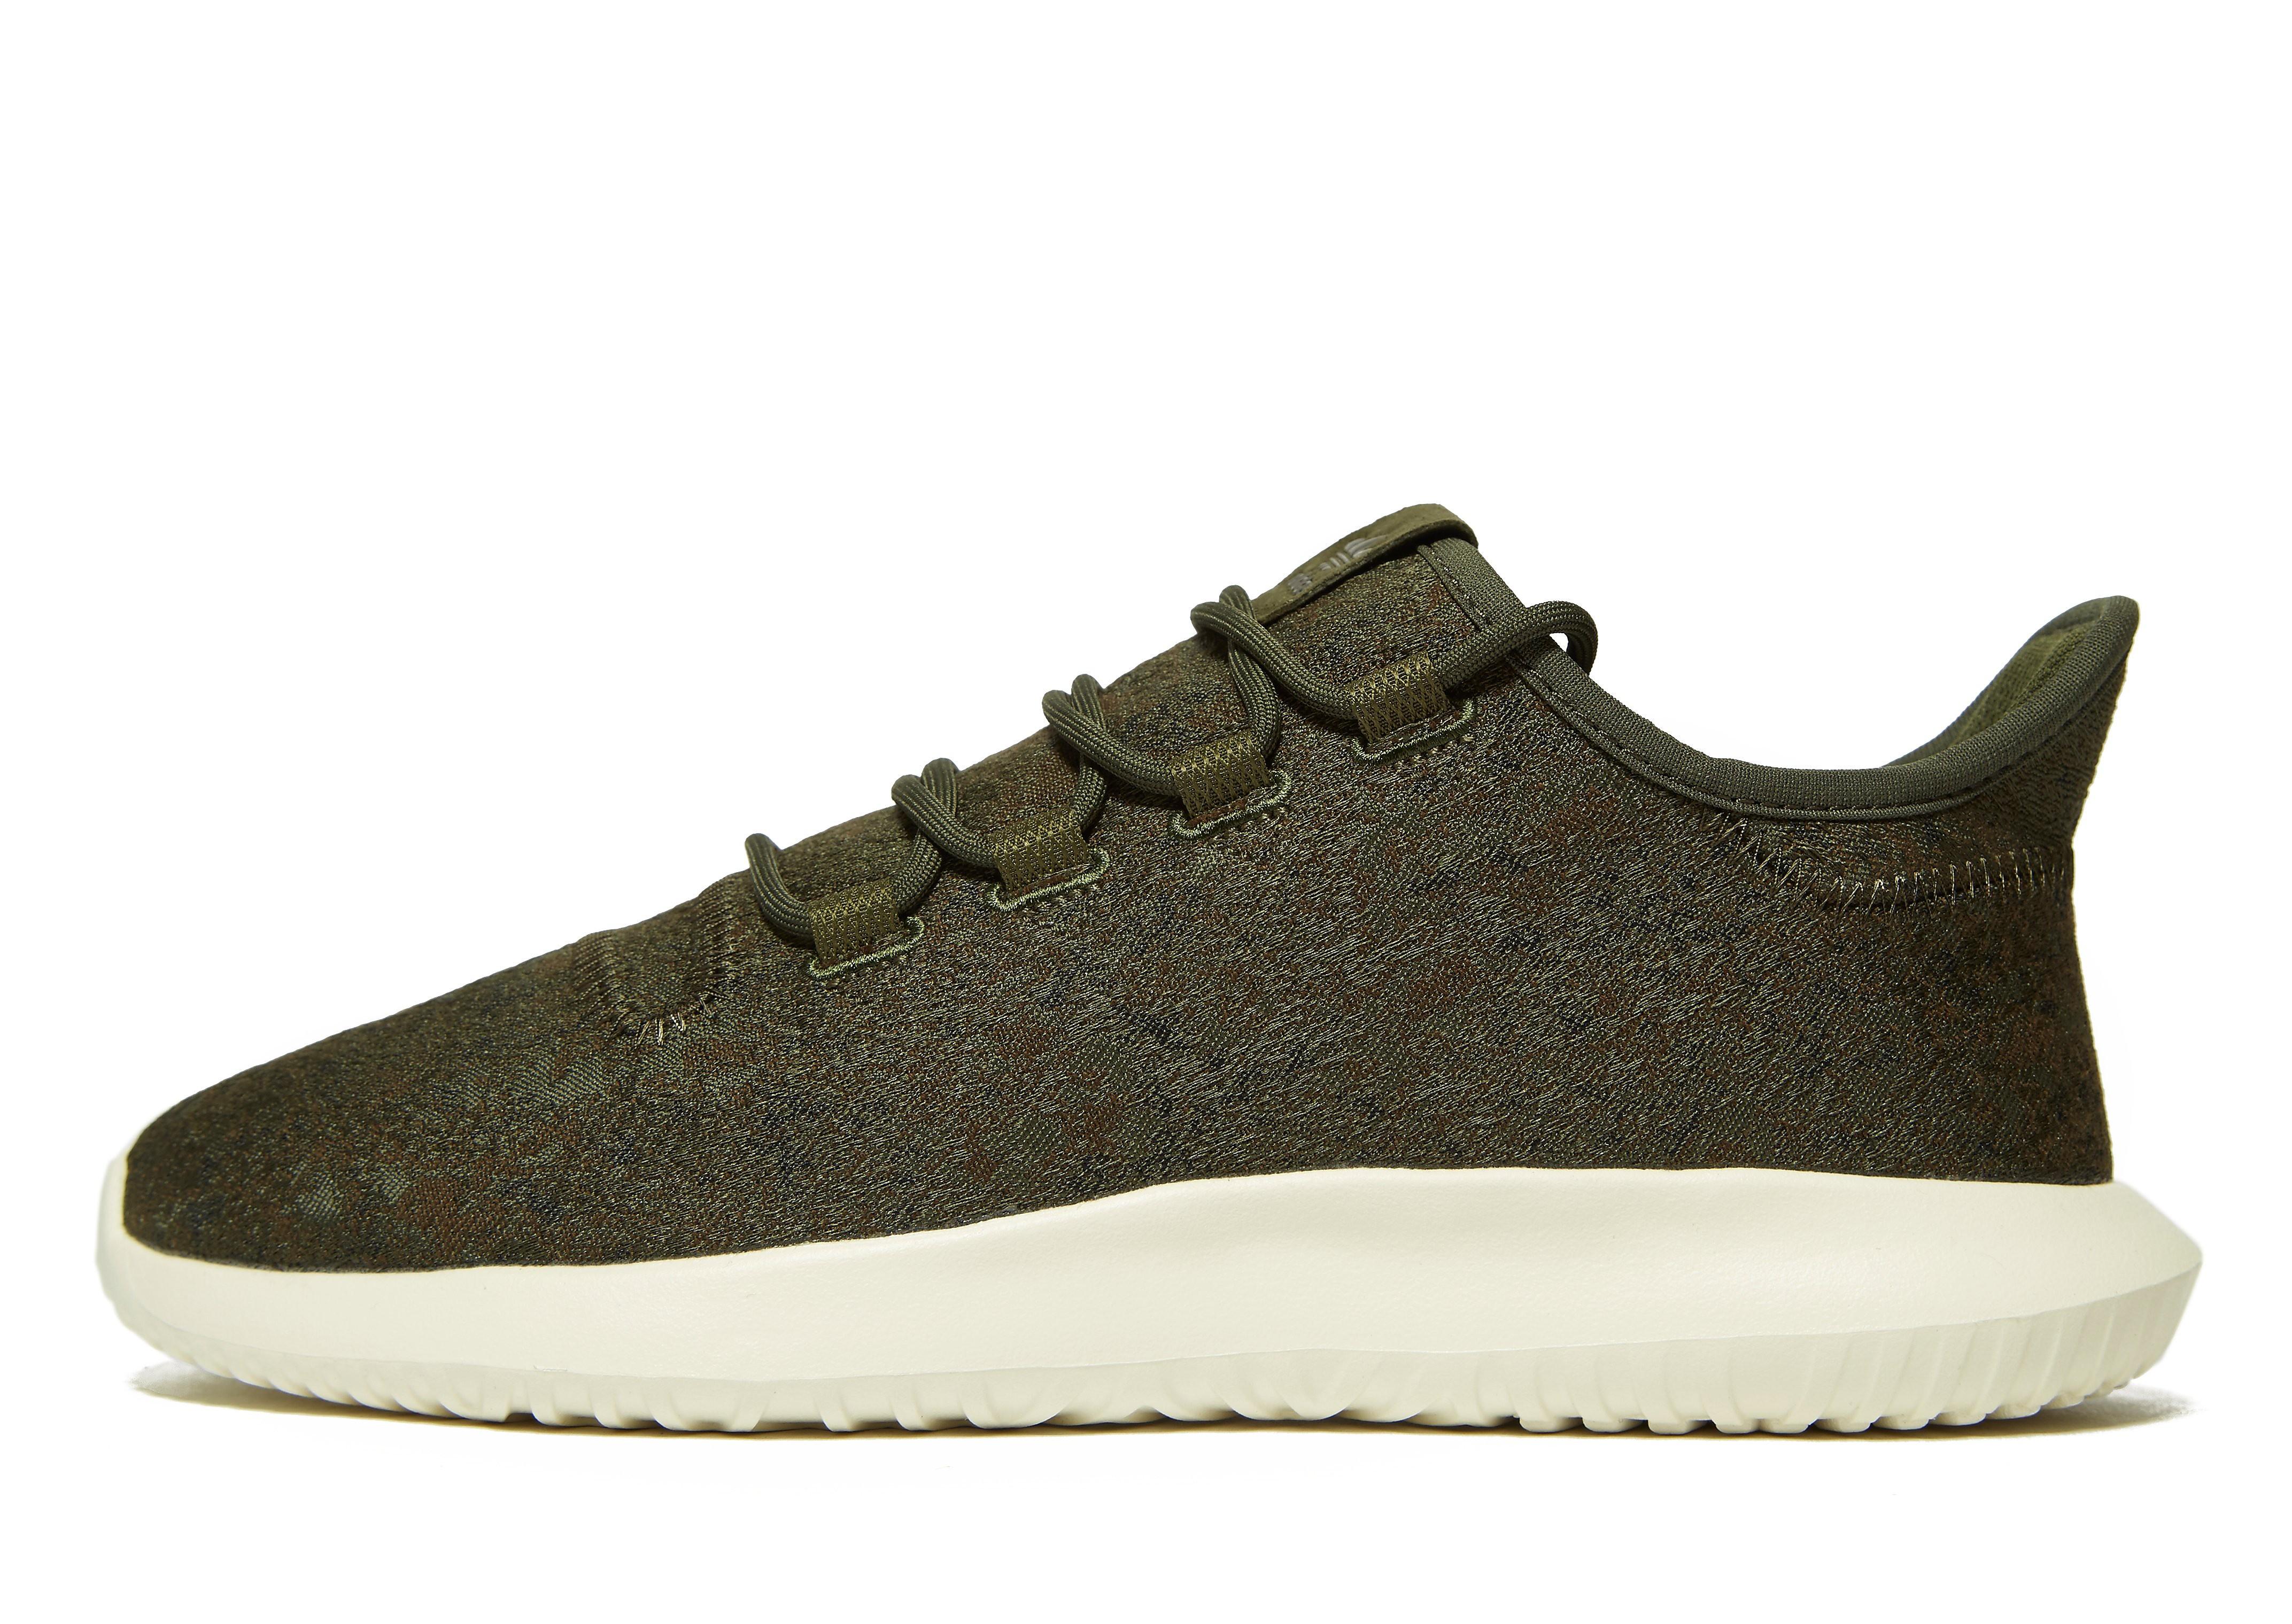 adidas Originals Tubular Shadow Jacquard